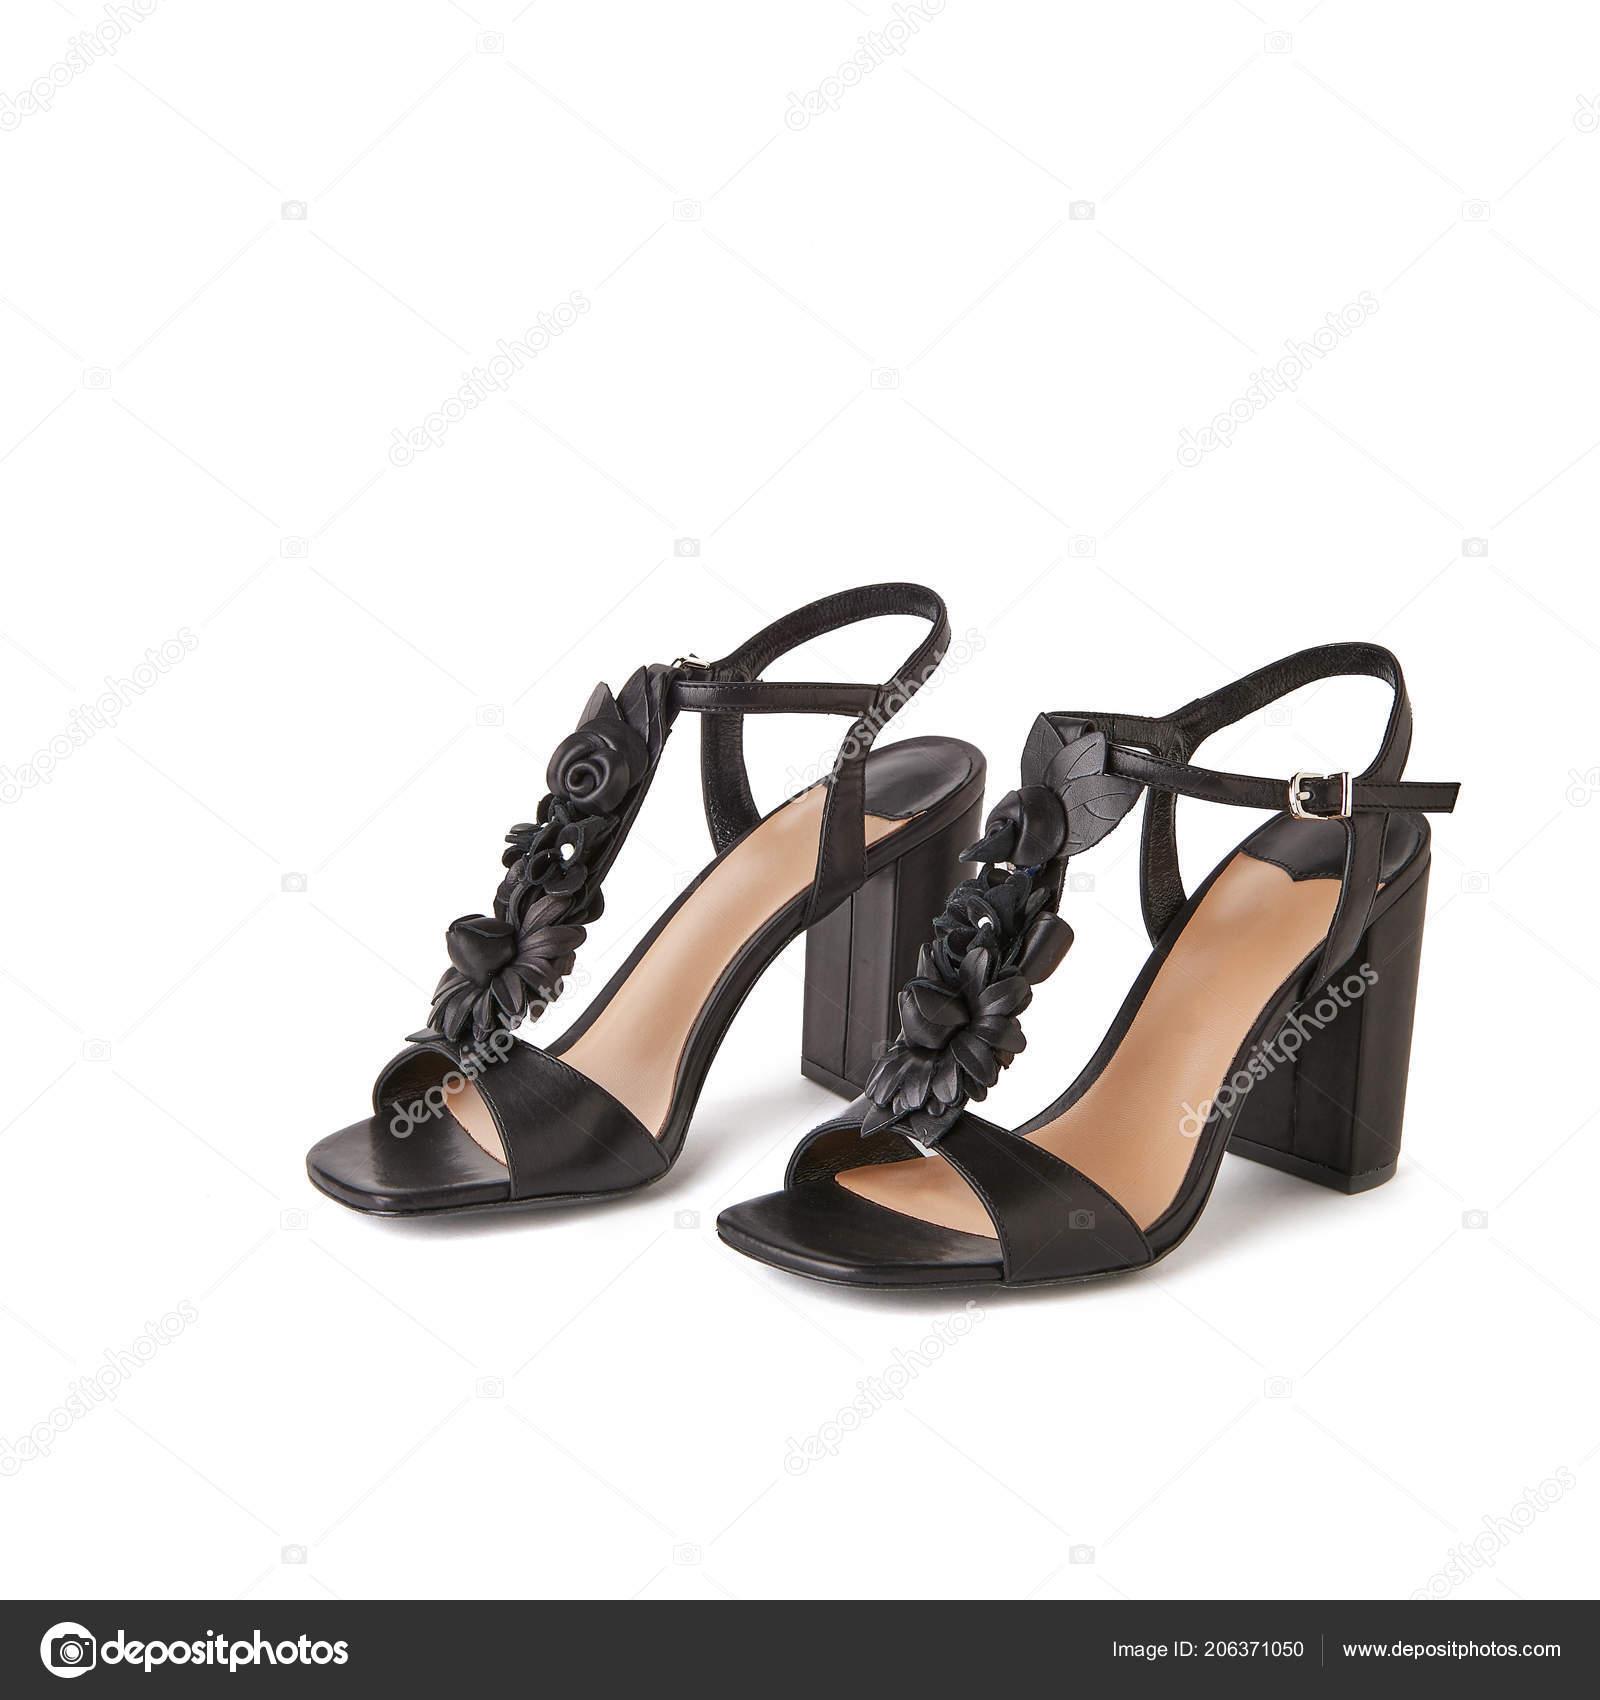 Black Block Heel Sandals Flowers Top Studio Shot White Background